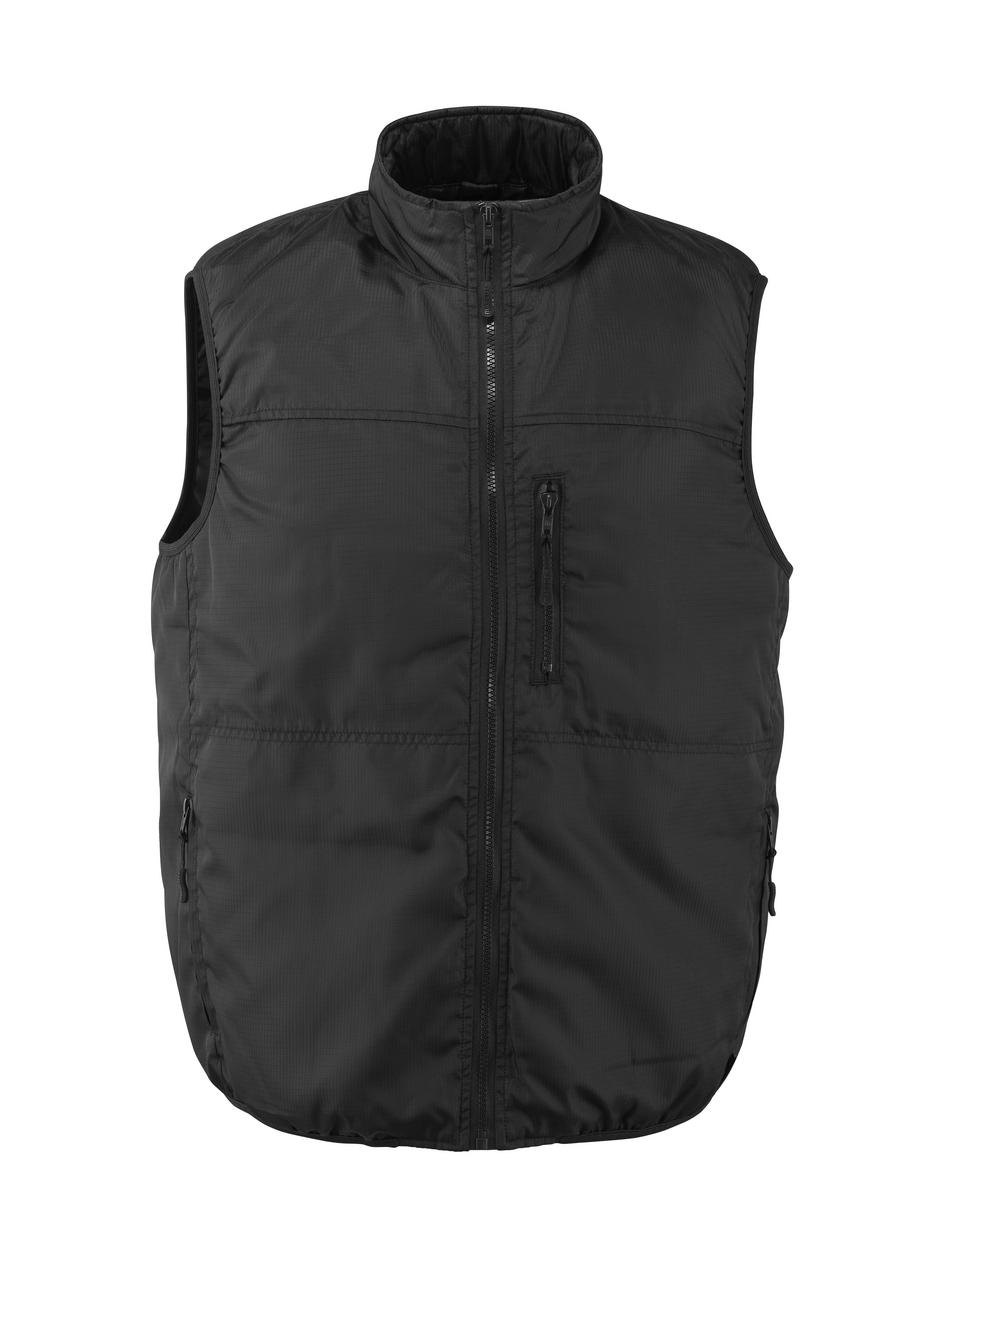 08090-179-09 Vest - svart